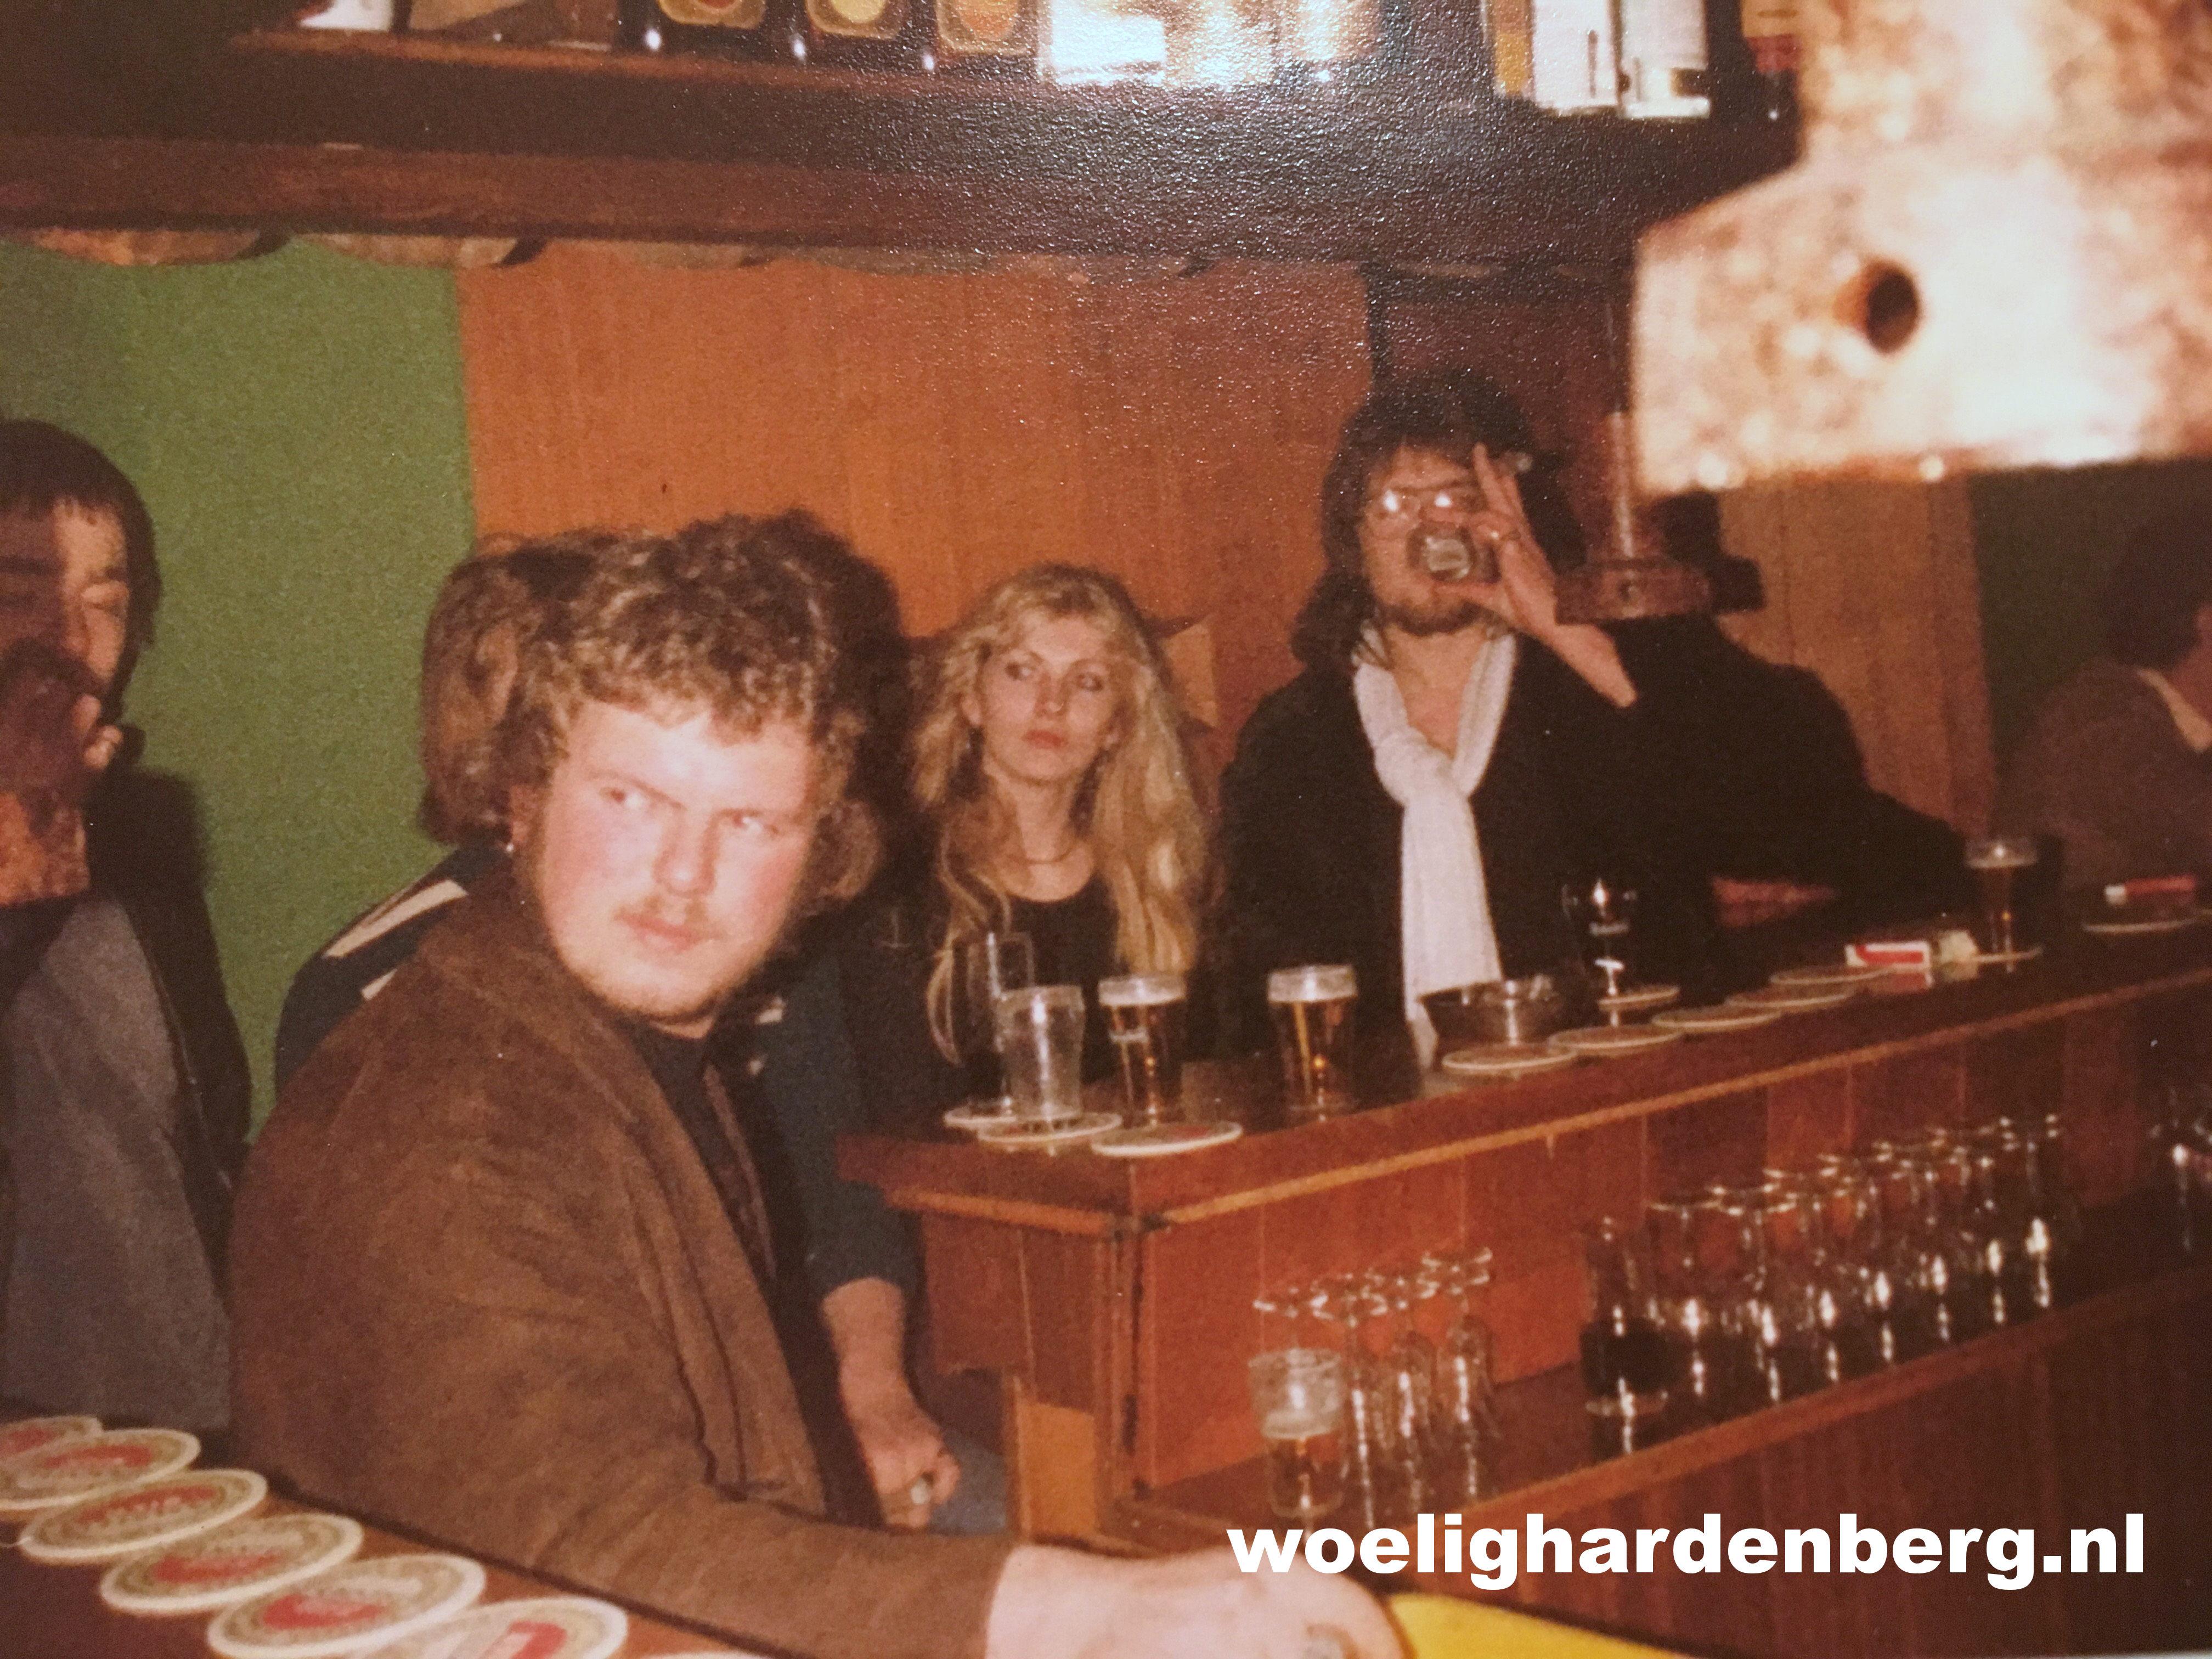 Gert Breukelman, Bert Waterink, Wemmi en Jan Borneman